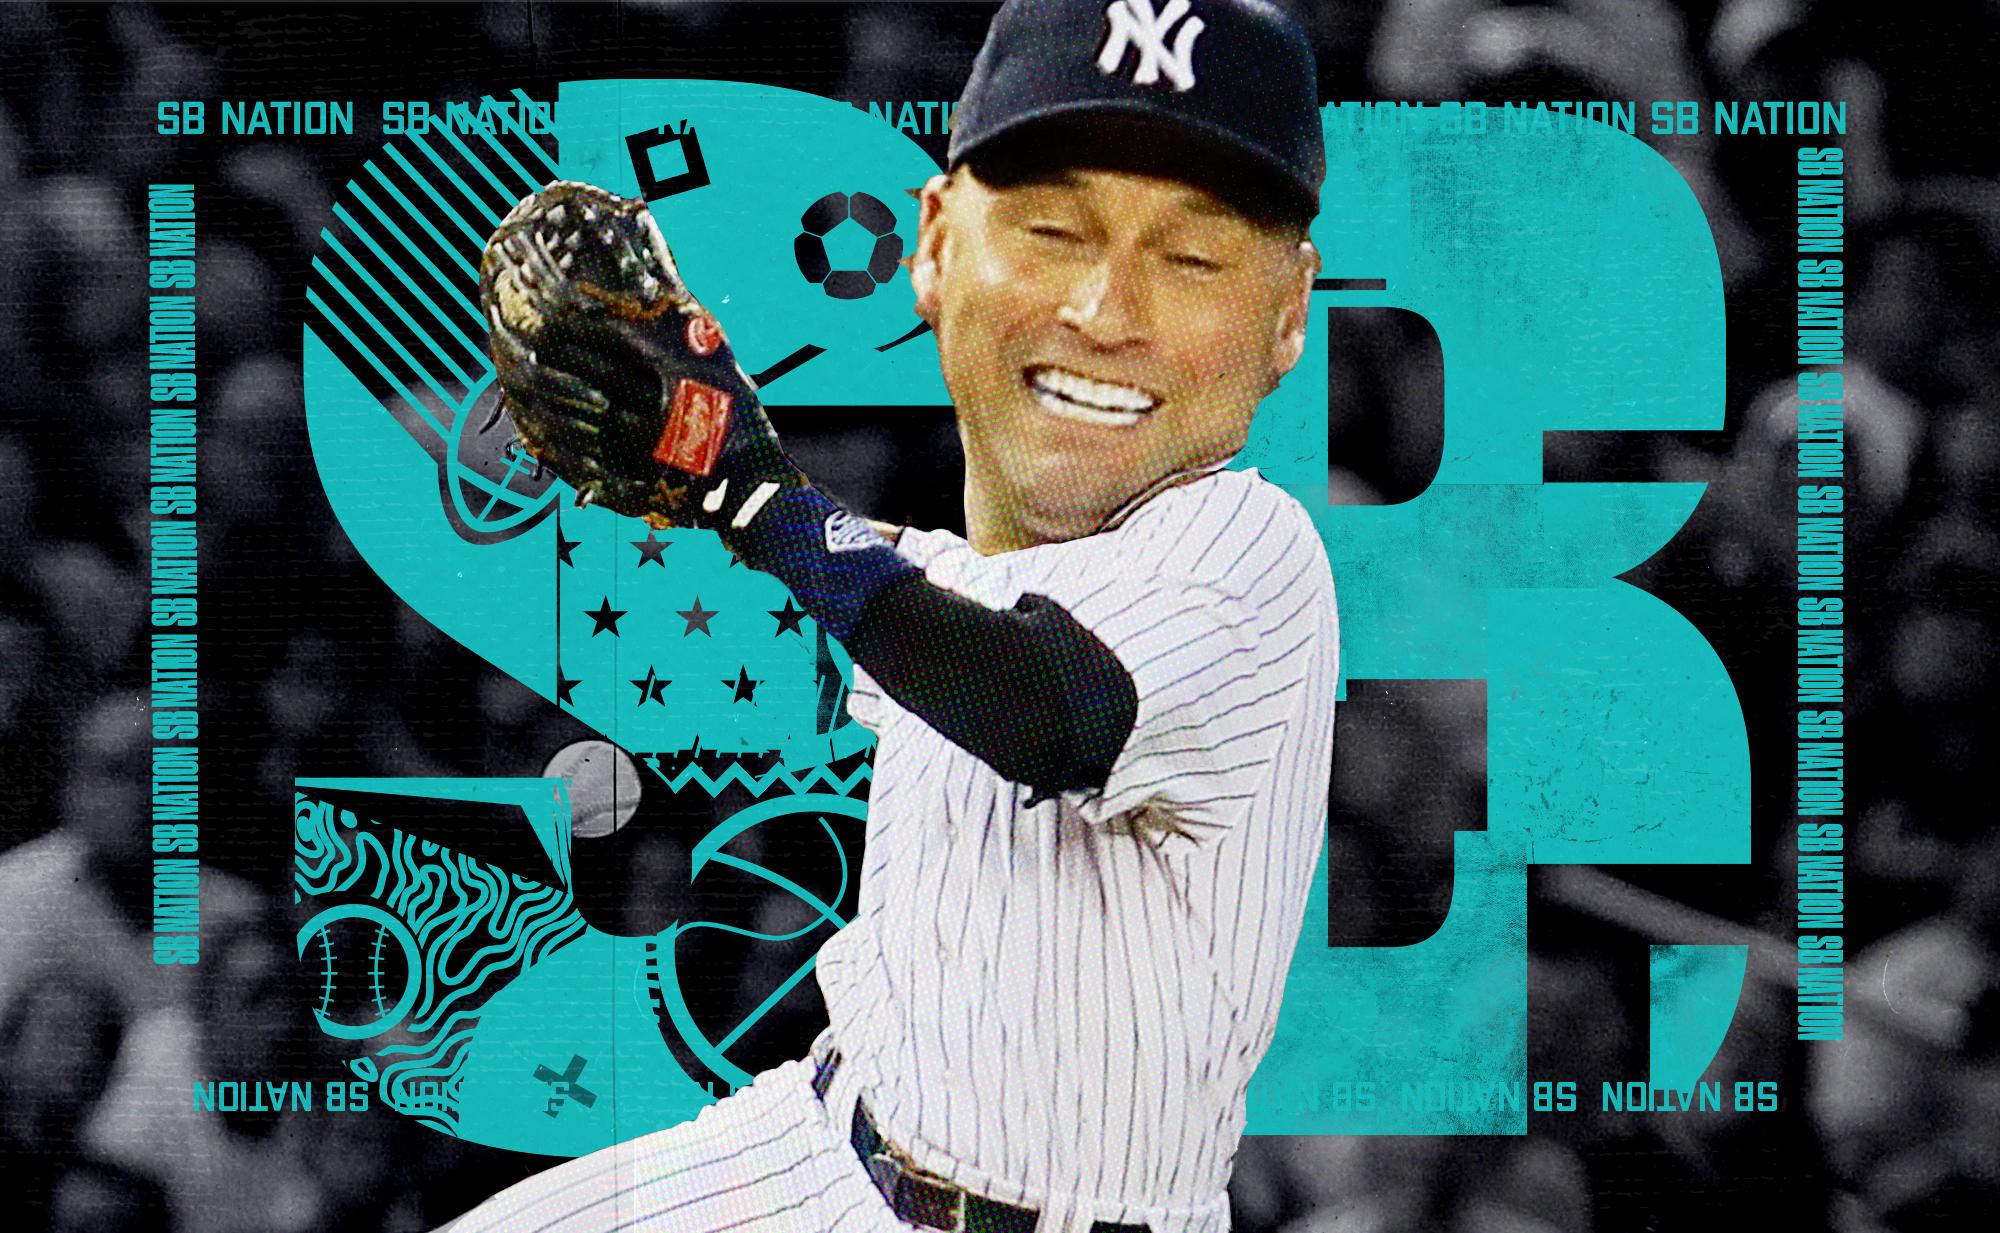 Derek Jeter's excellence redefined the Yankees